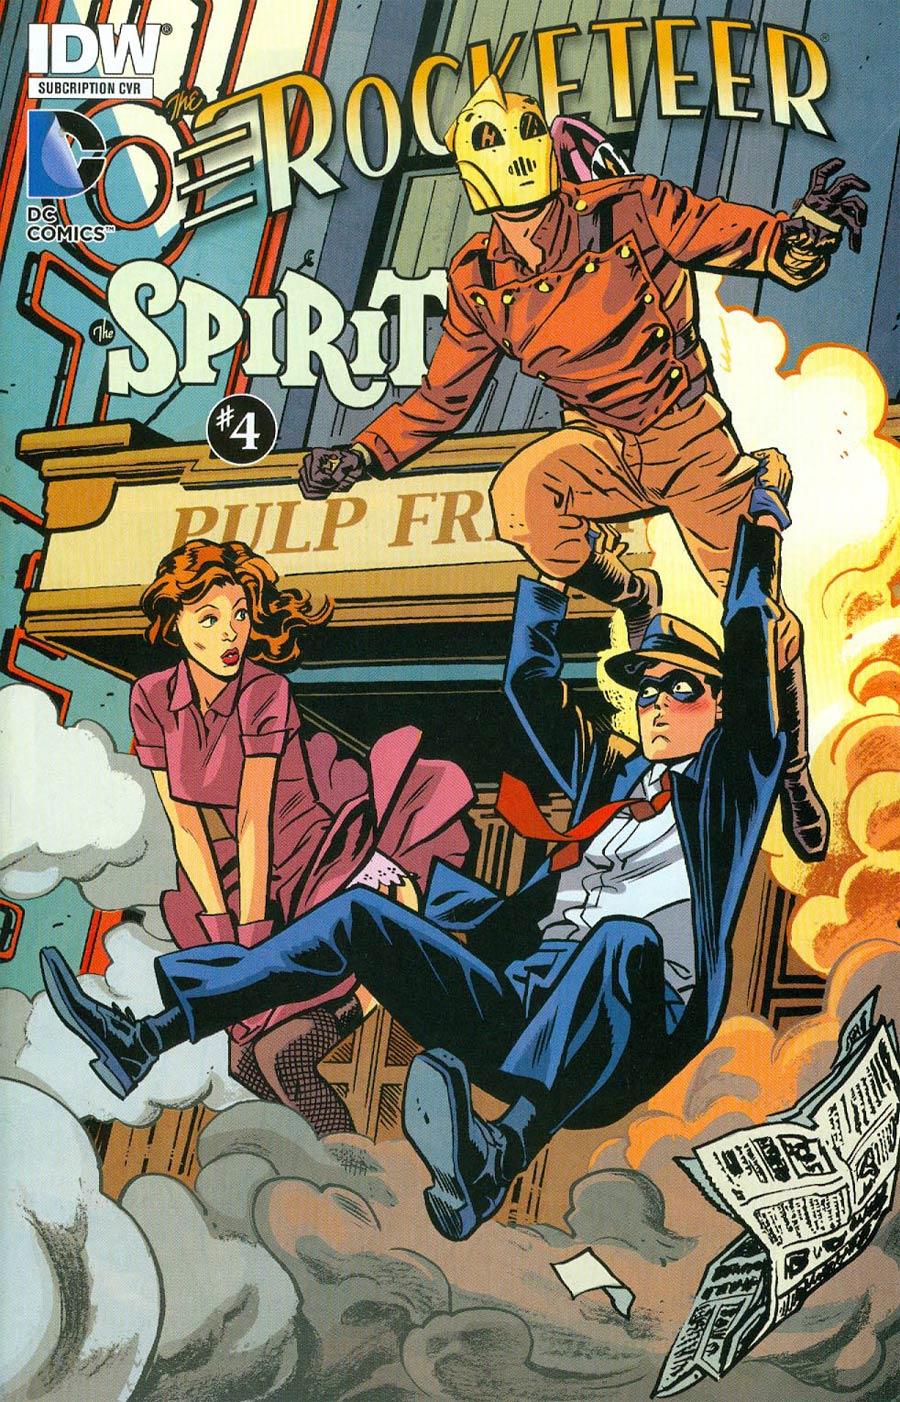 Rocketeer Spirit Pulp Friction #4 Cover B Variant Chris Samnee Subscription Cover